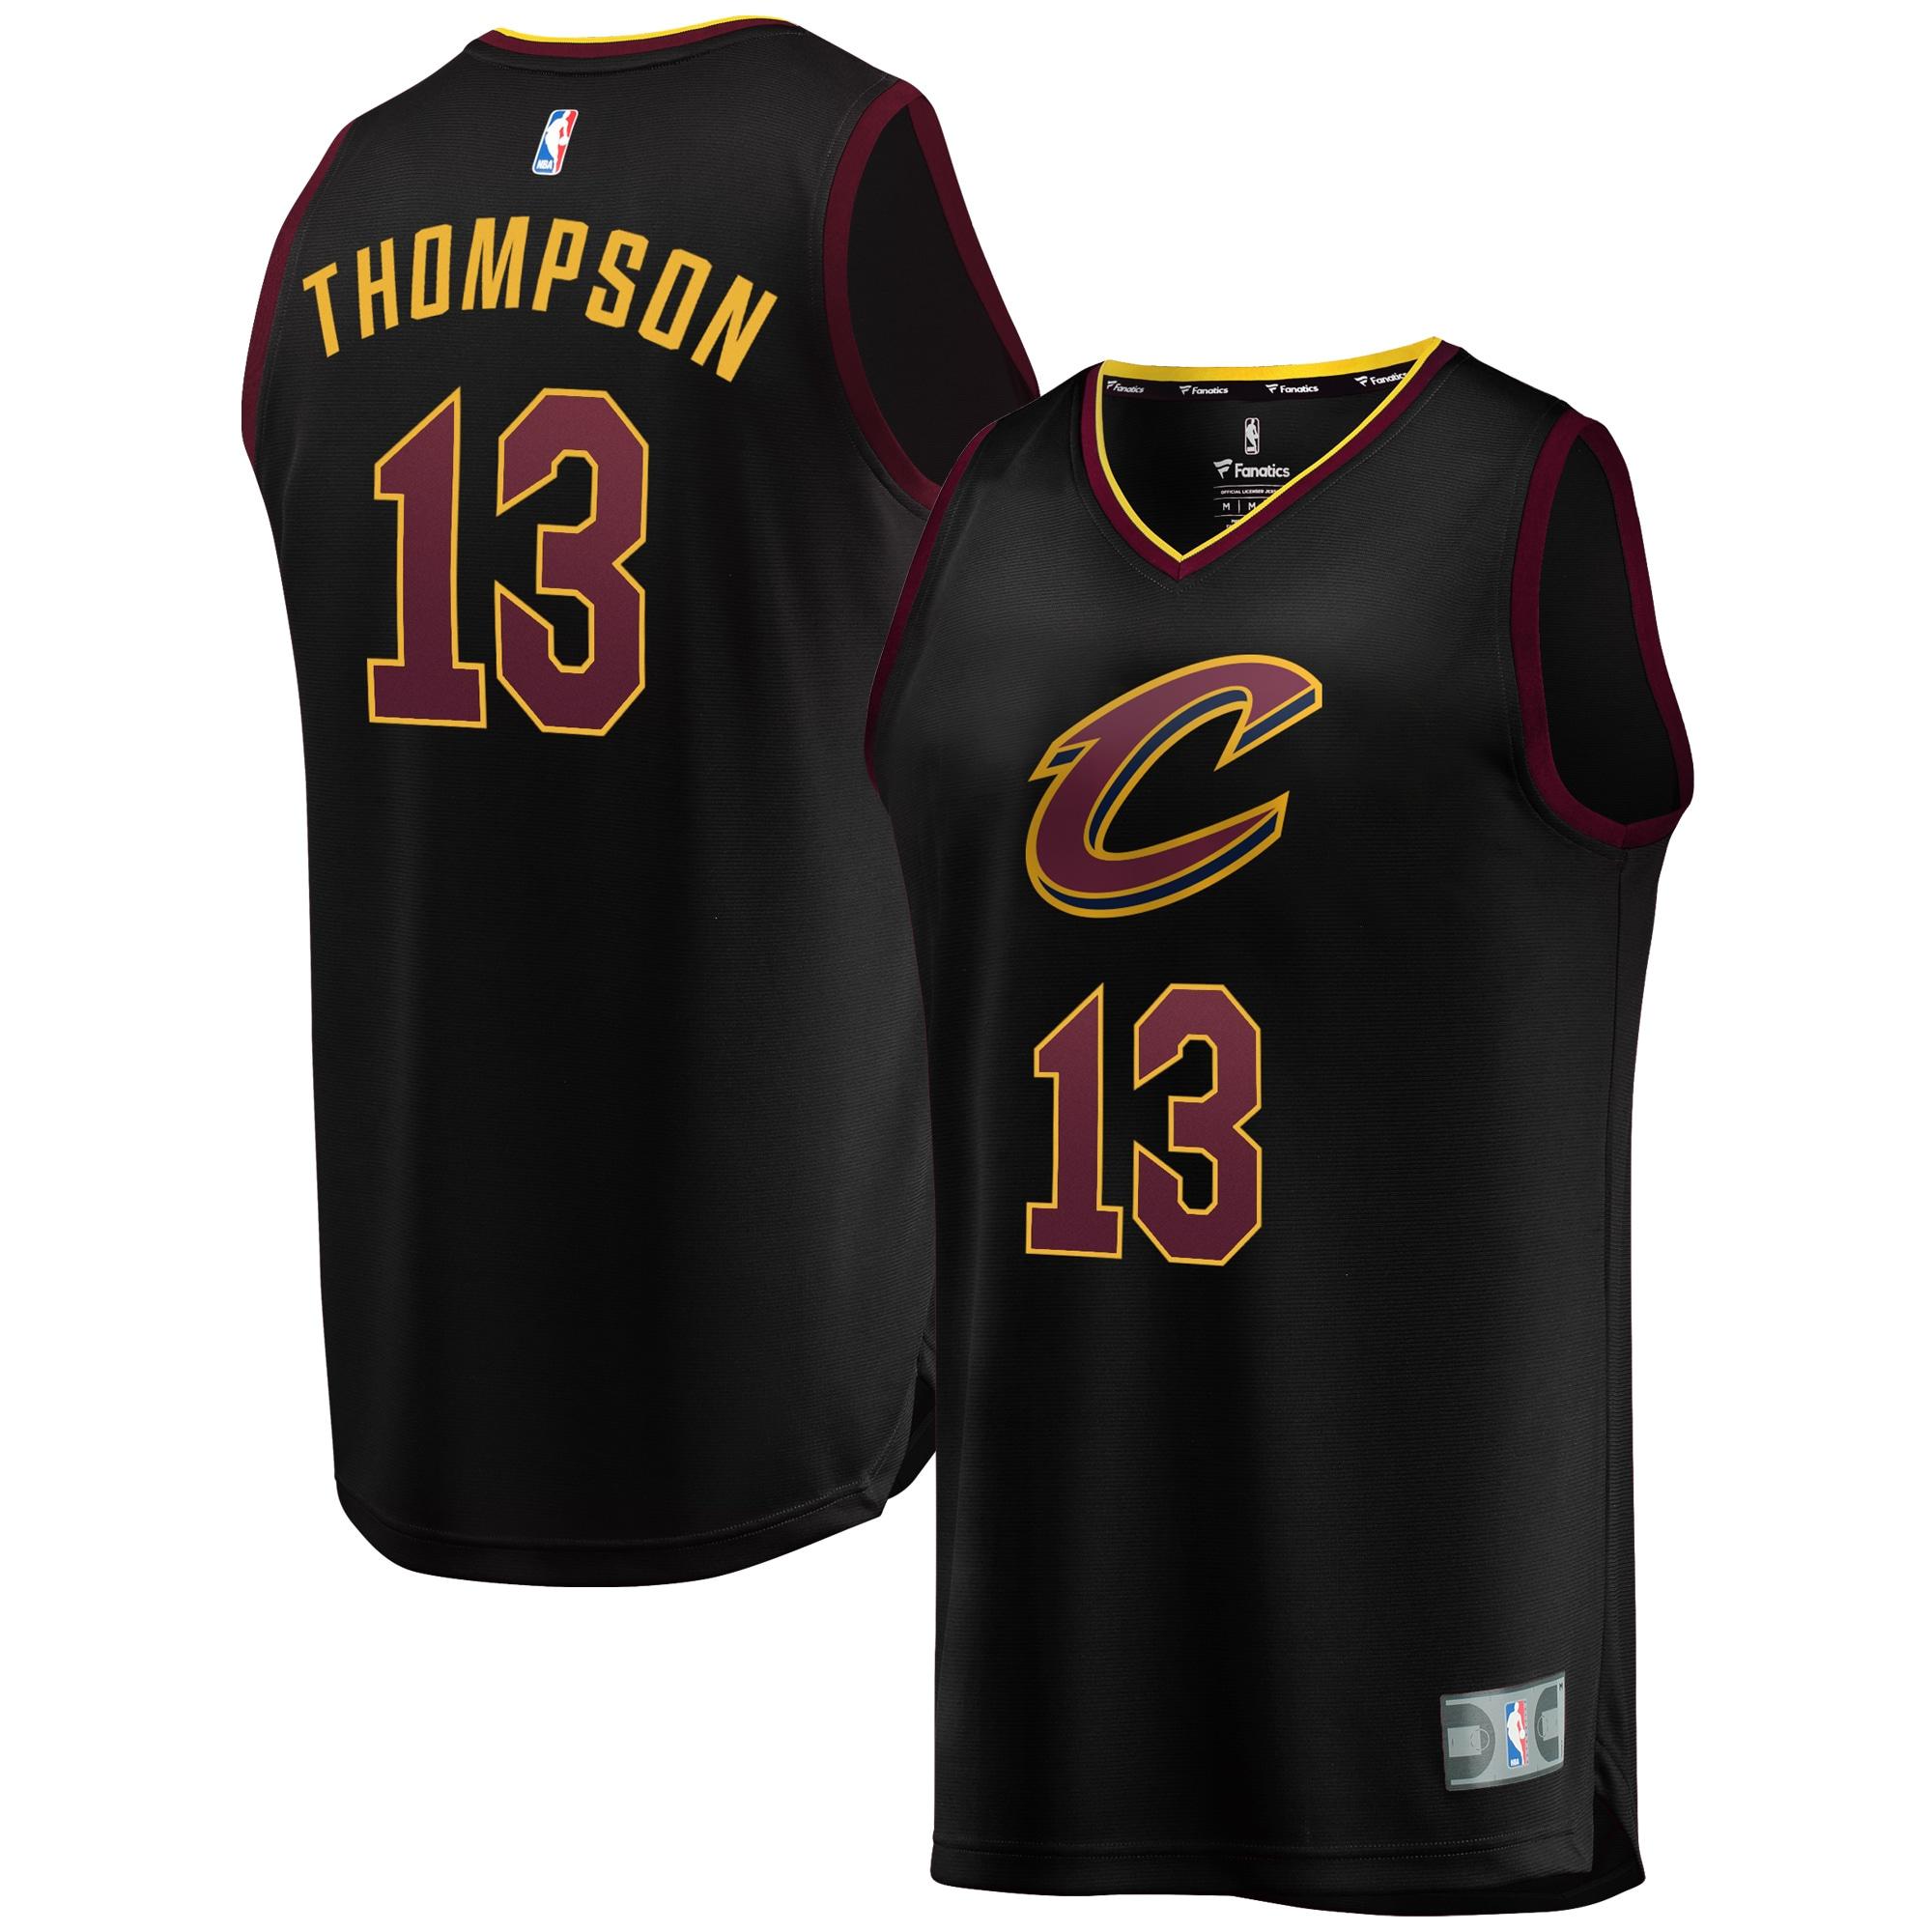 Tristan Thompson Cleveland Cavaliers Fanatics Branded Fast Break Replica Jersey Black - Statement Edition